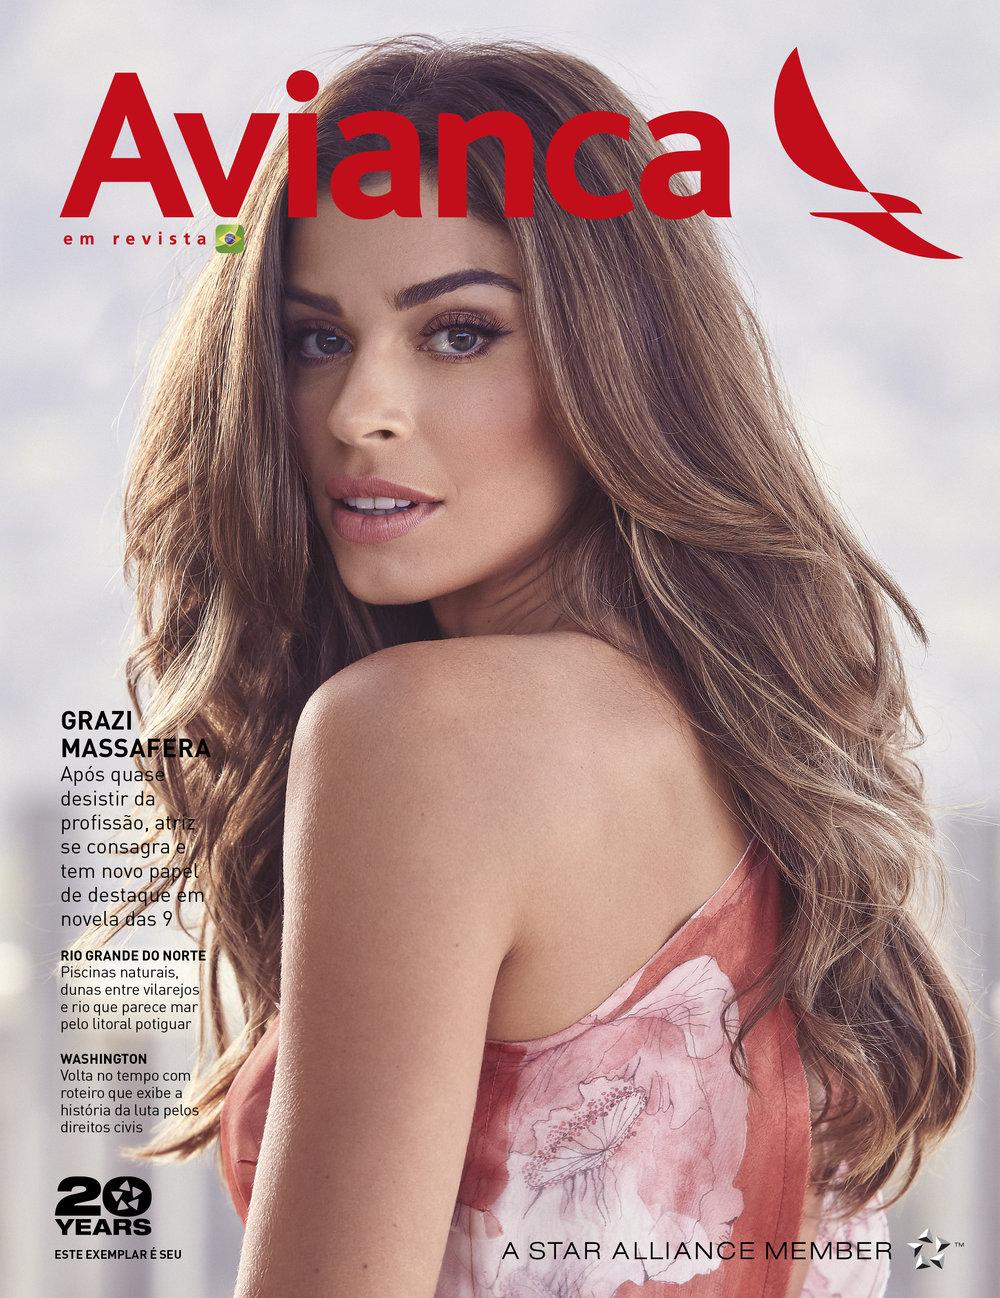 Avianca ✚ Brazil